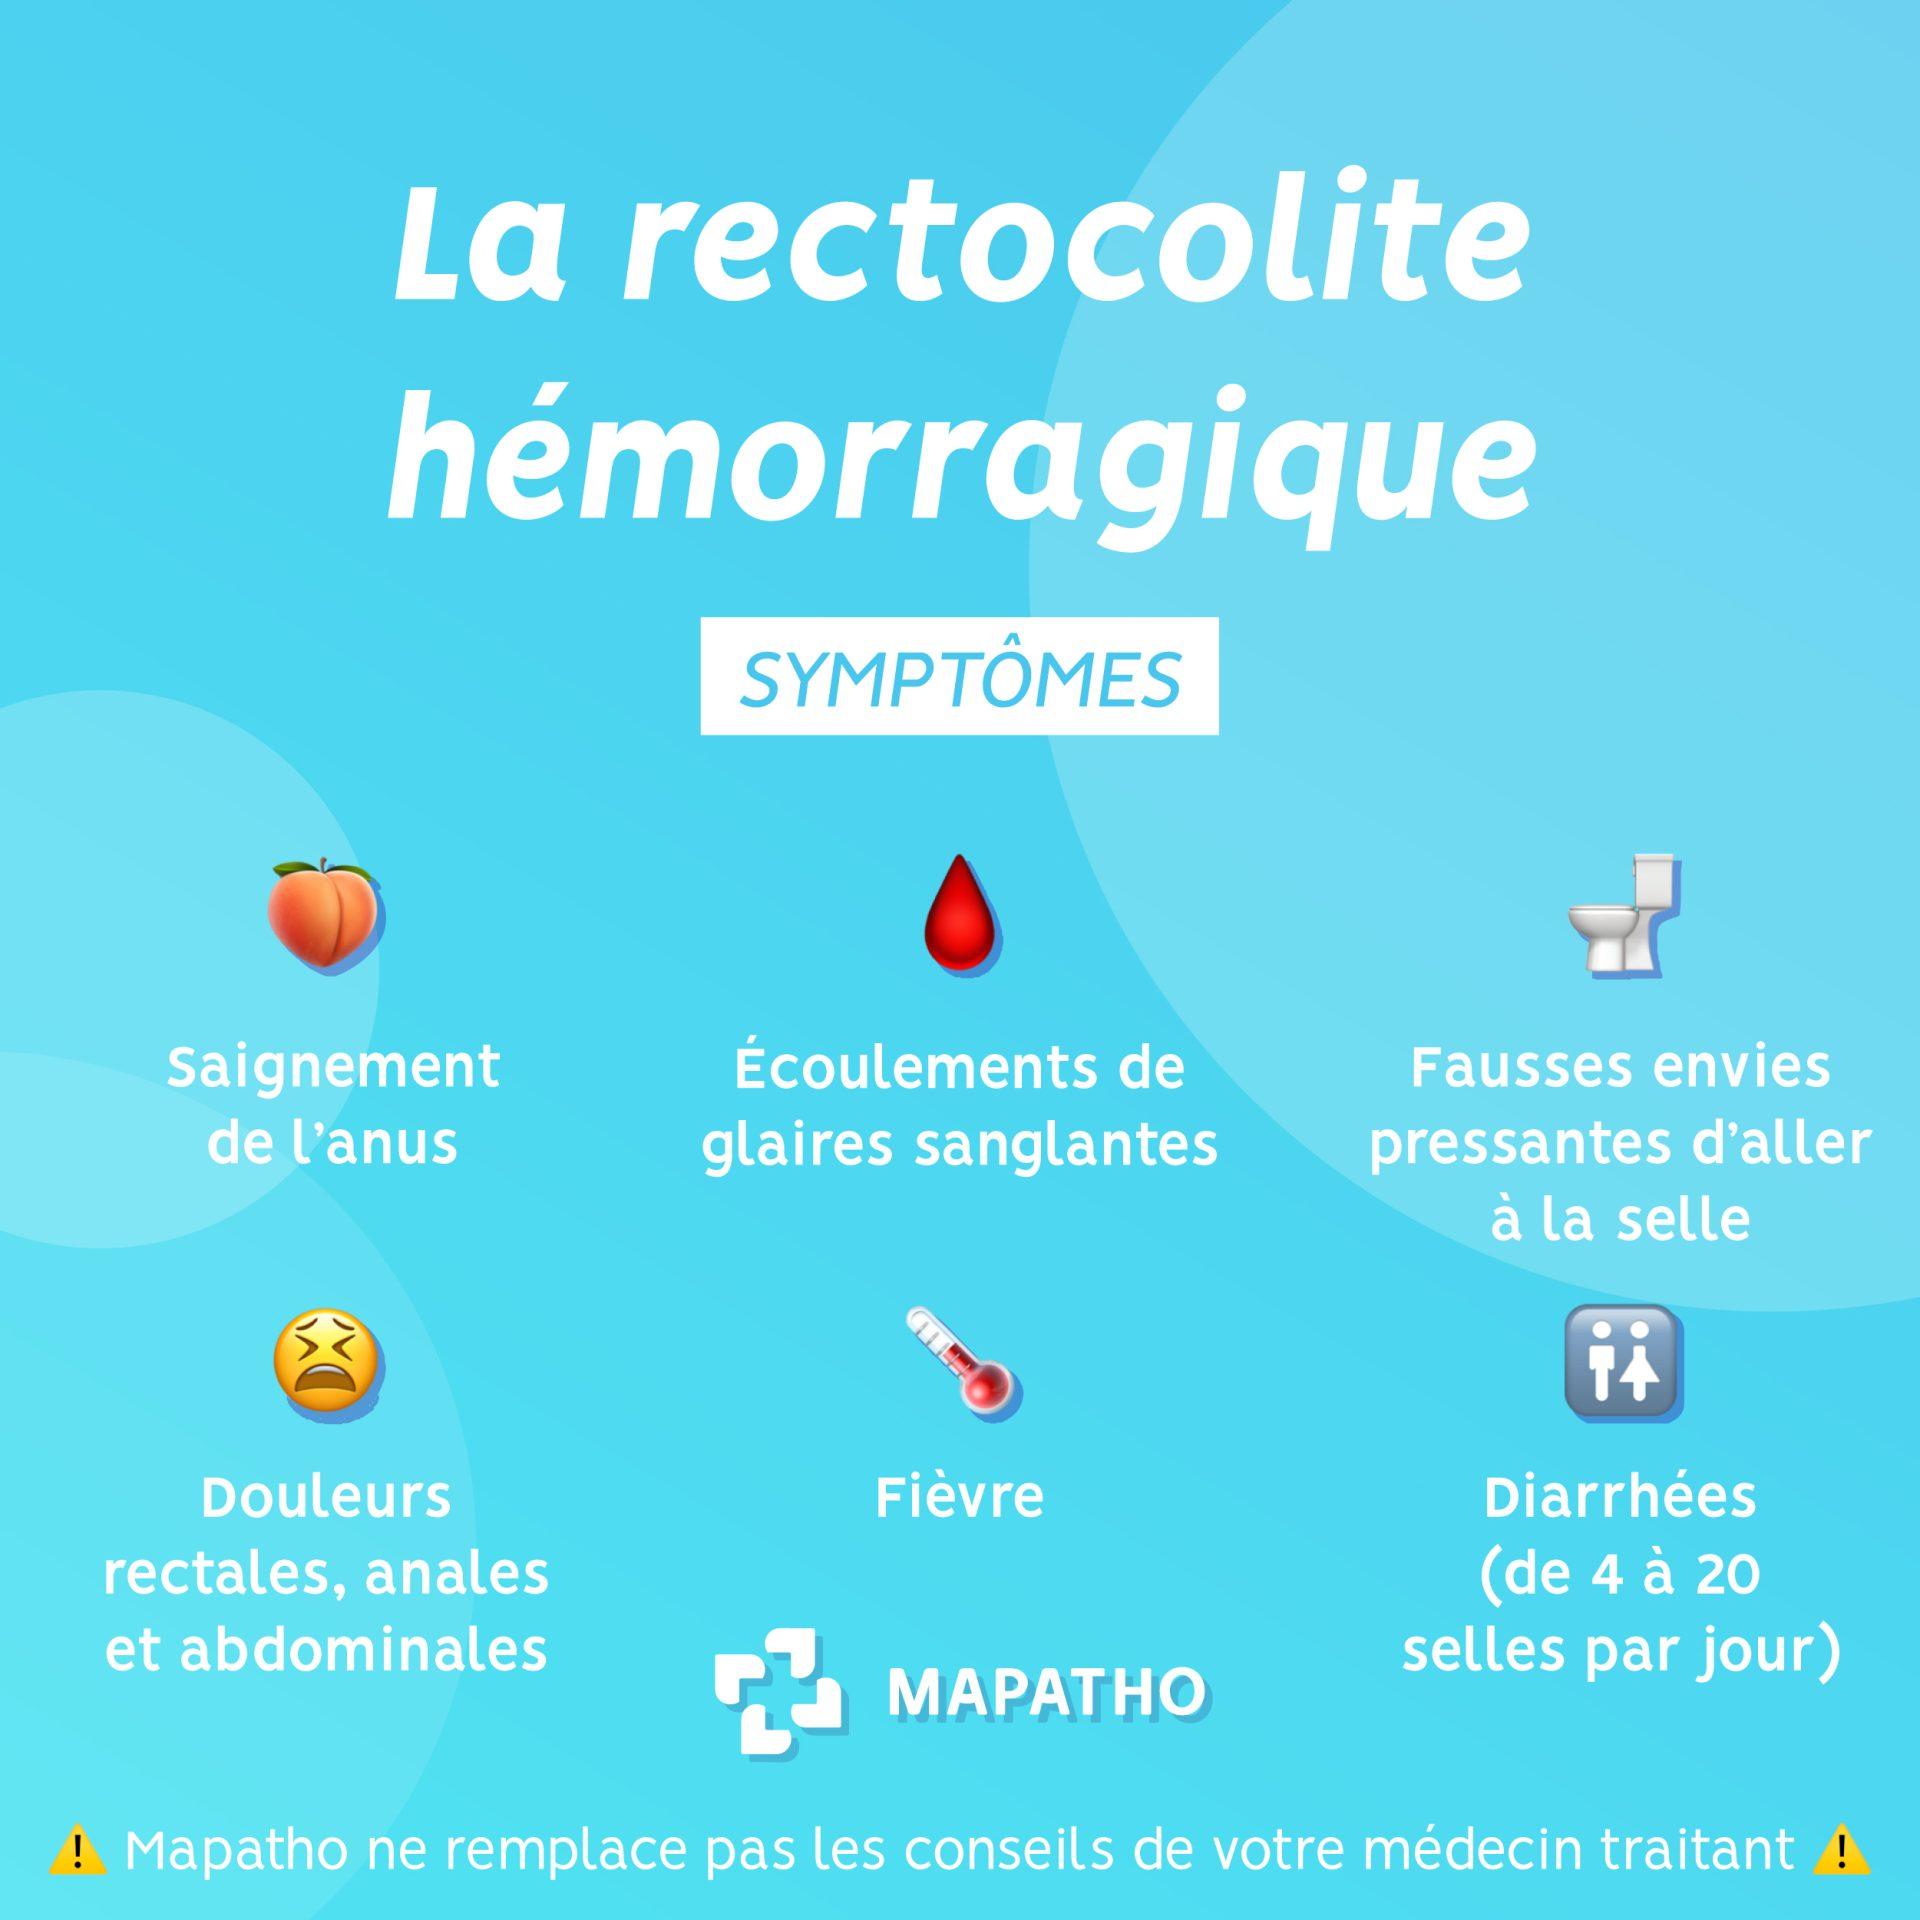 Les symptomes de la rectocolite hemorragique